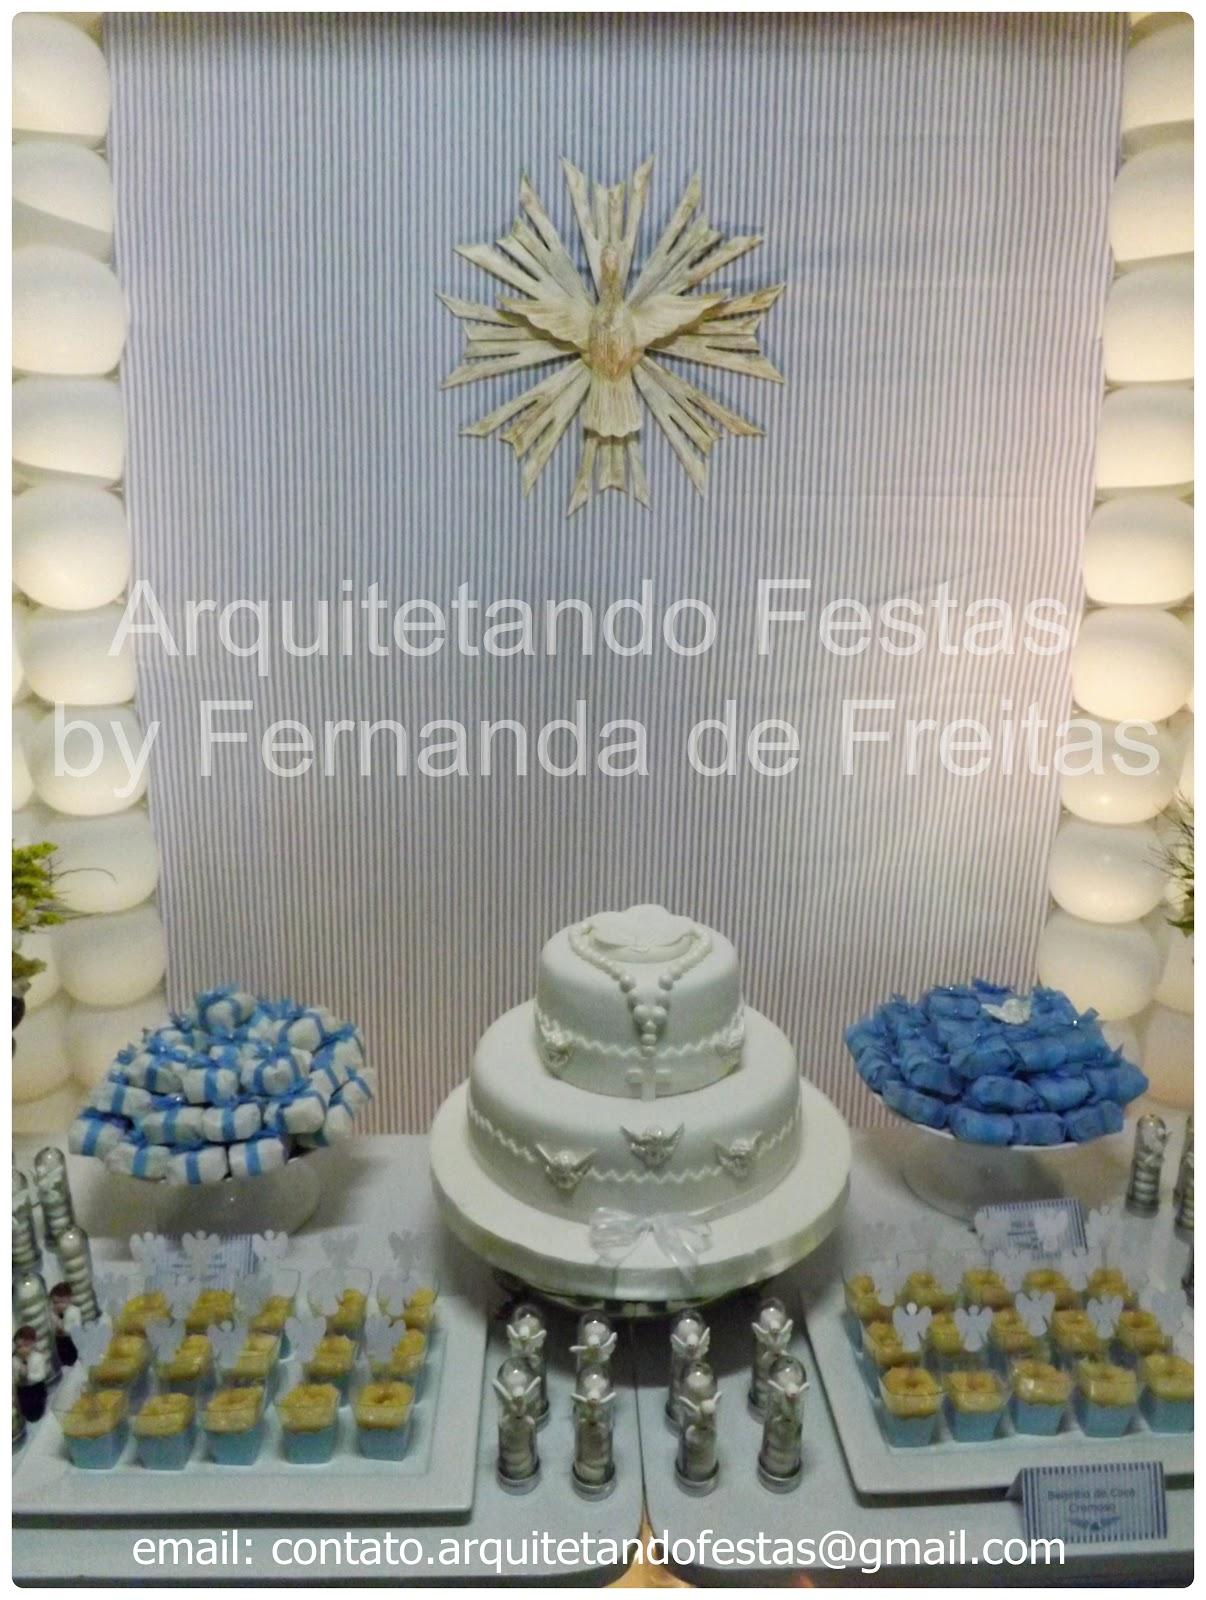 Fernanda de Freitas photos